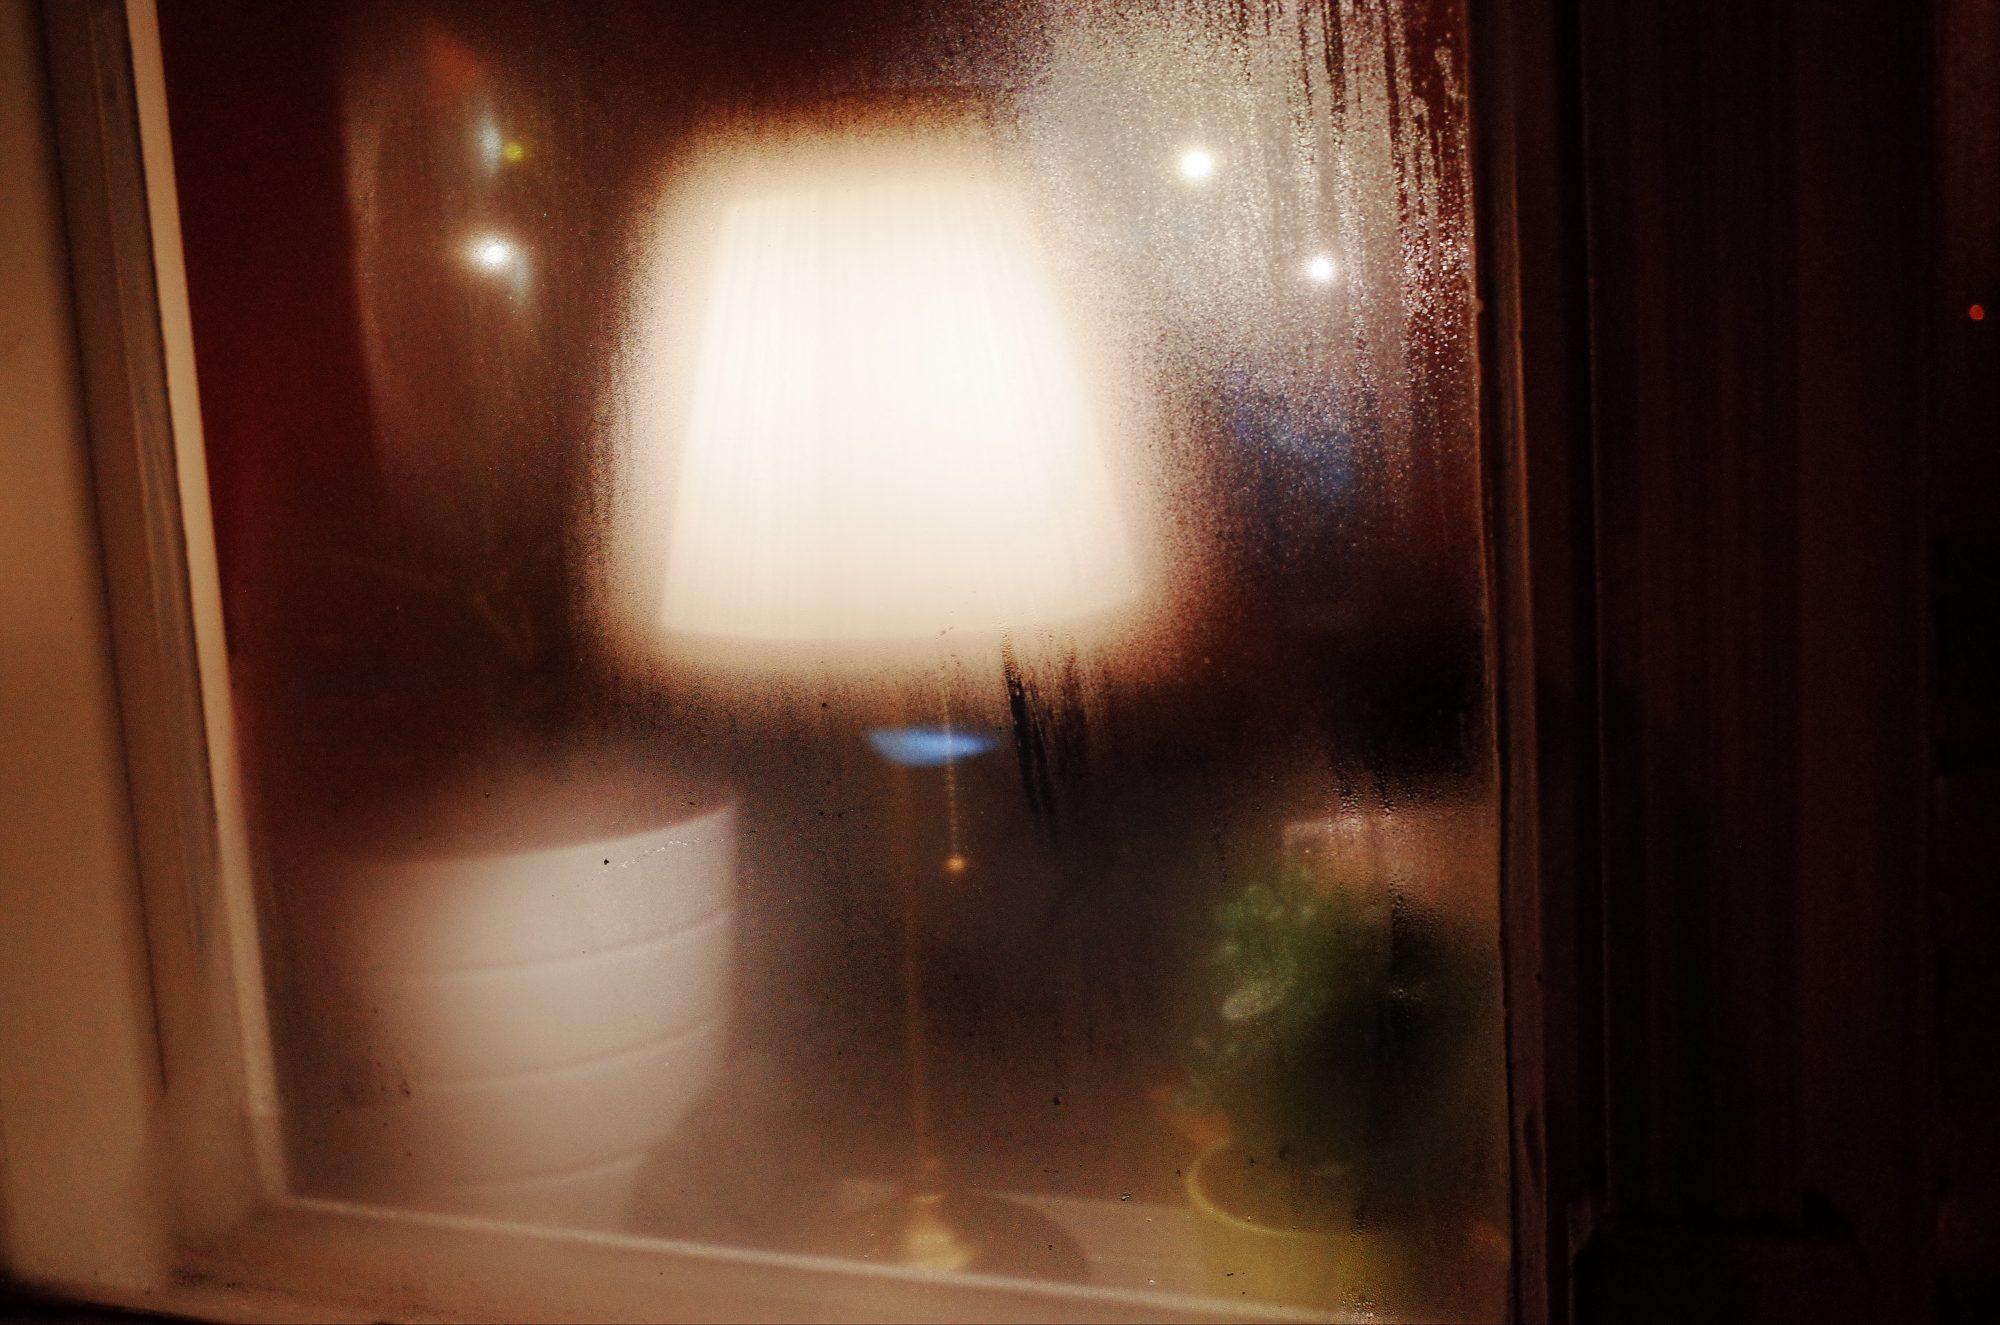 Foggy lamp through window. Prague, 2017